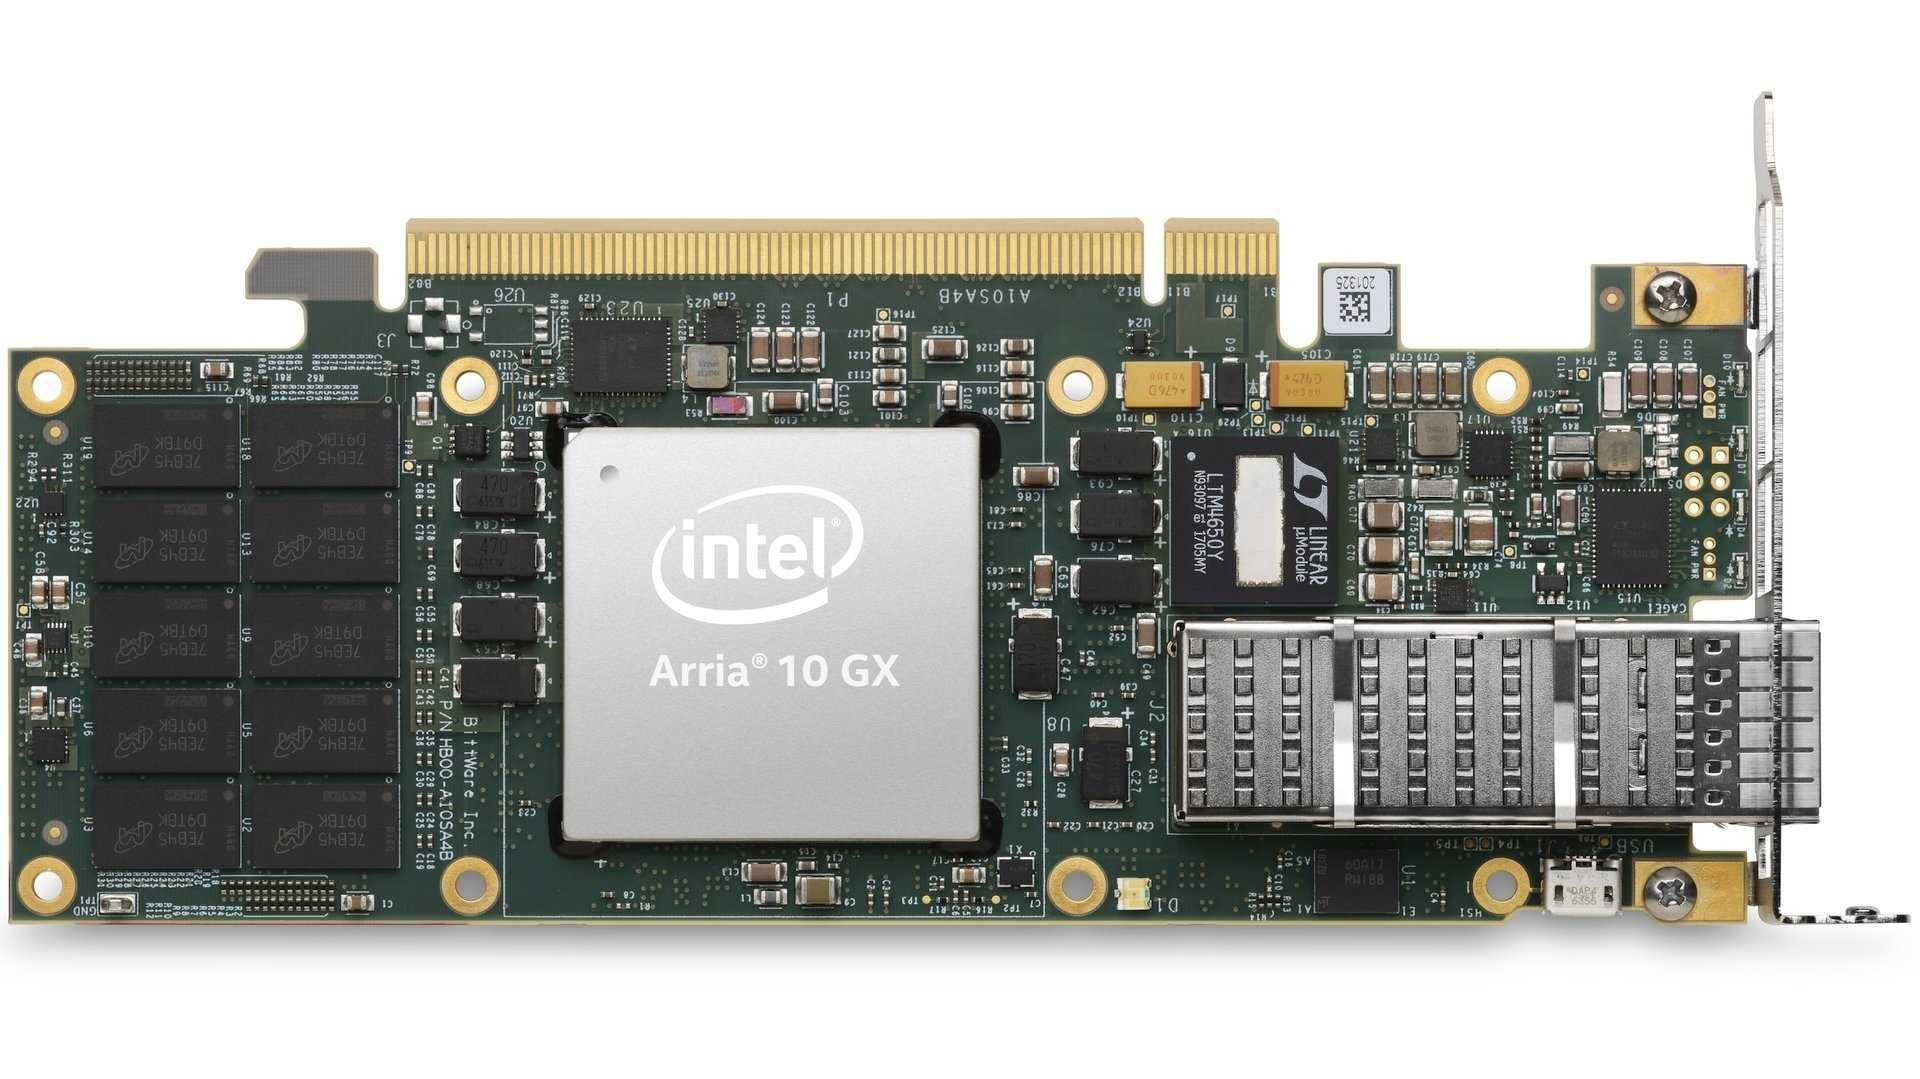 PCIe-FPGA-Karte mit Intel Arria 10 GX